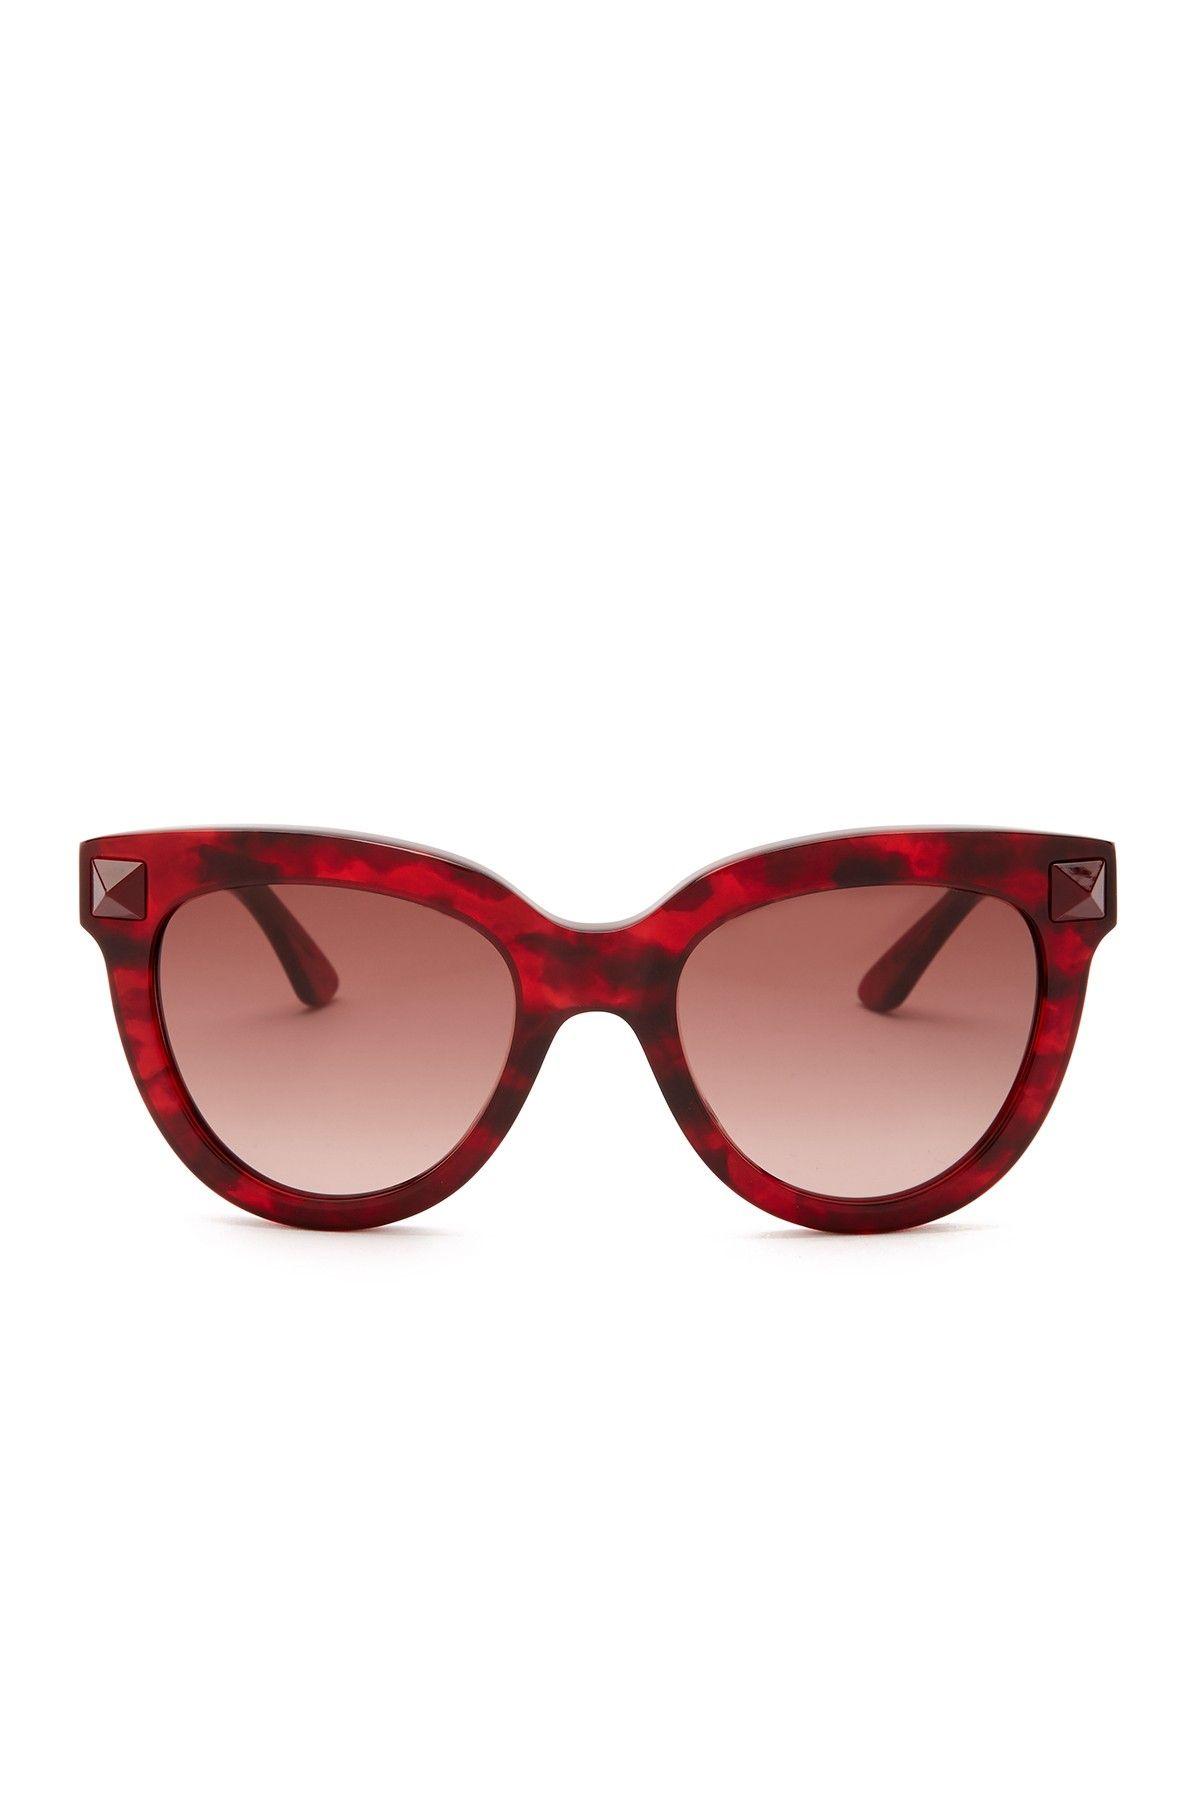 b185a59854c6 Women s Rockstud Cat Eye Sunglasses by Valentino on  nordstrom rack